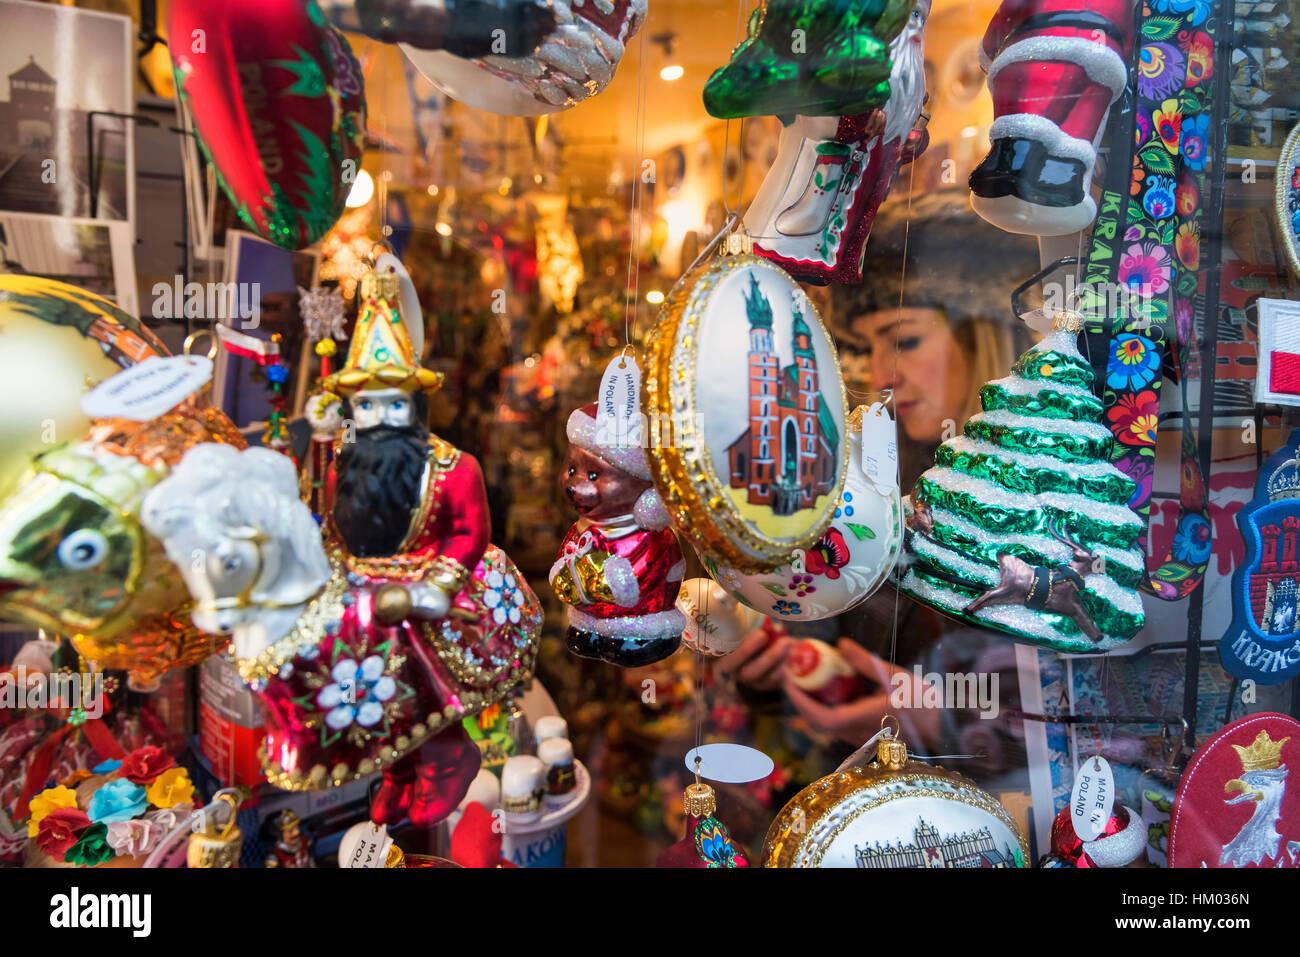 Gift shop christmas Krakow Poland Cracow Stock Photo: 132768237 - Alamy